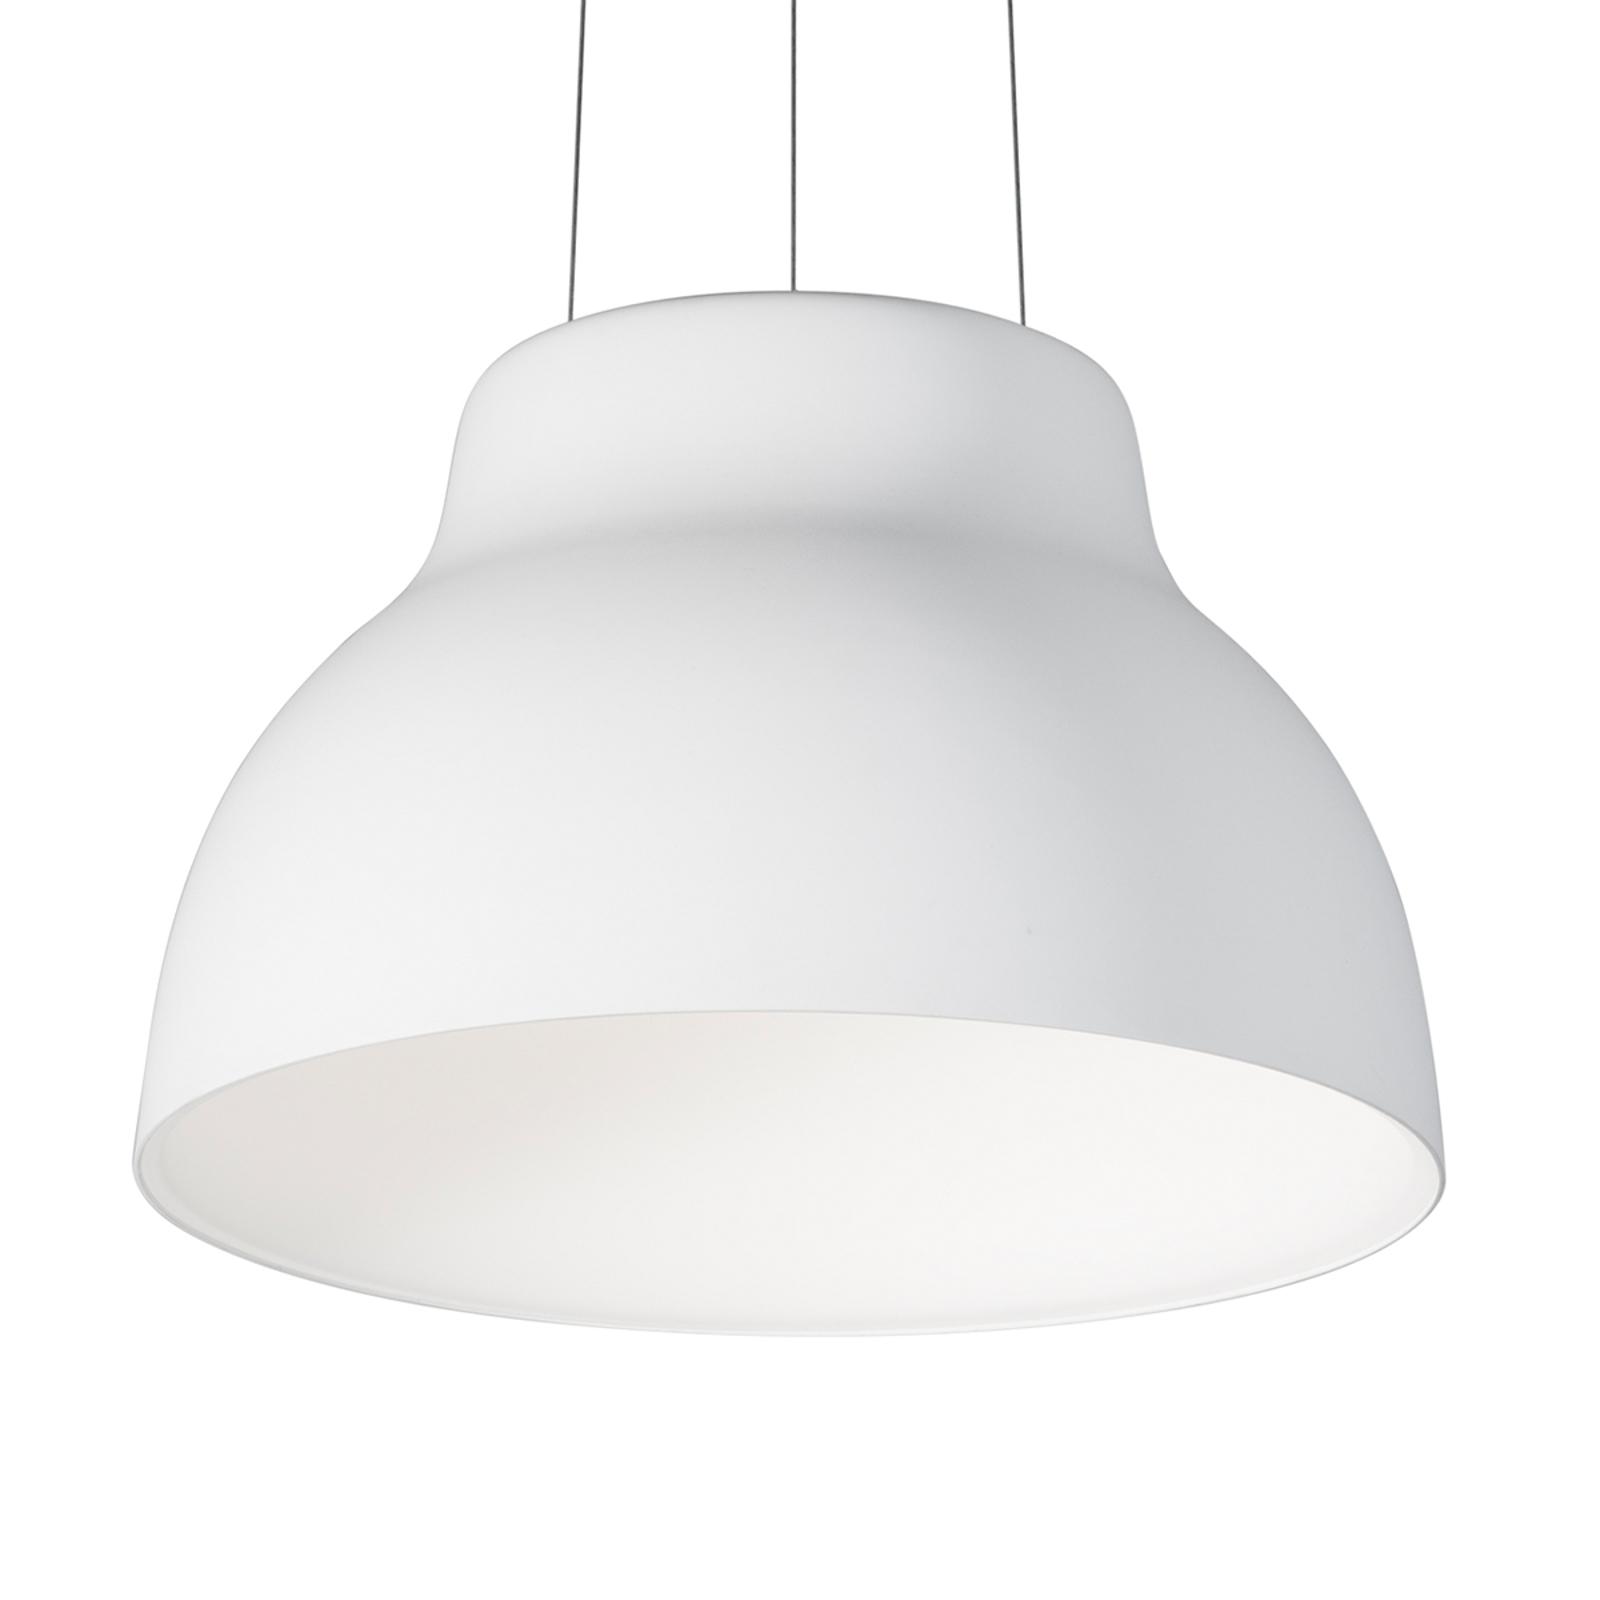 Martinelli Luce Cicala - LED-Pendelleuchte, weiß